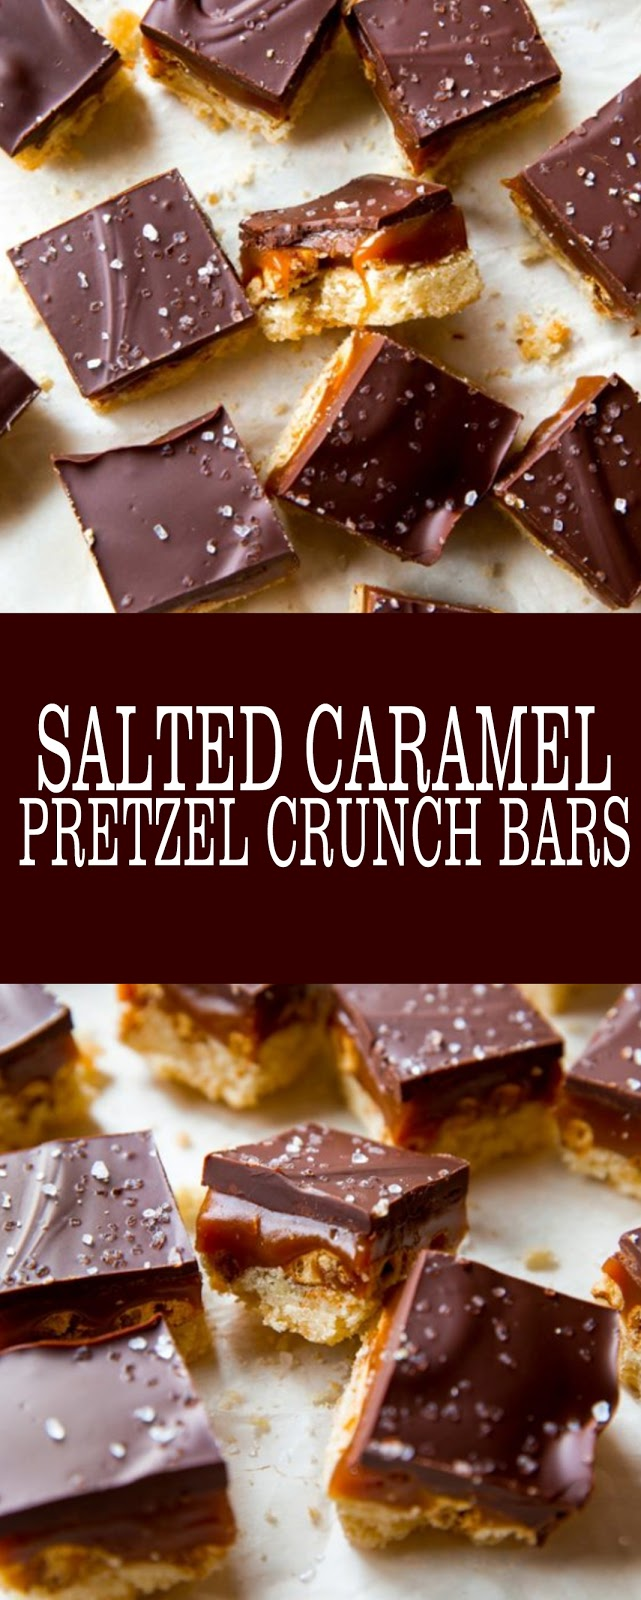 Salted Caramel Pretzel Crunch Bars #bars #caramel